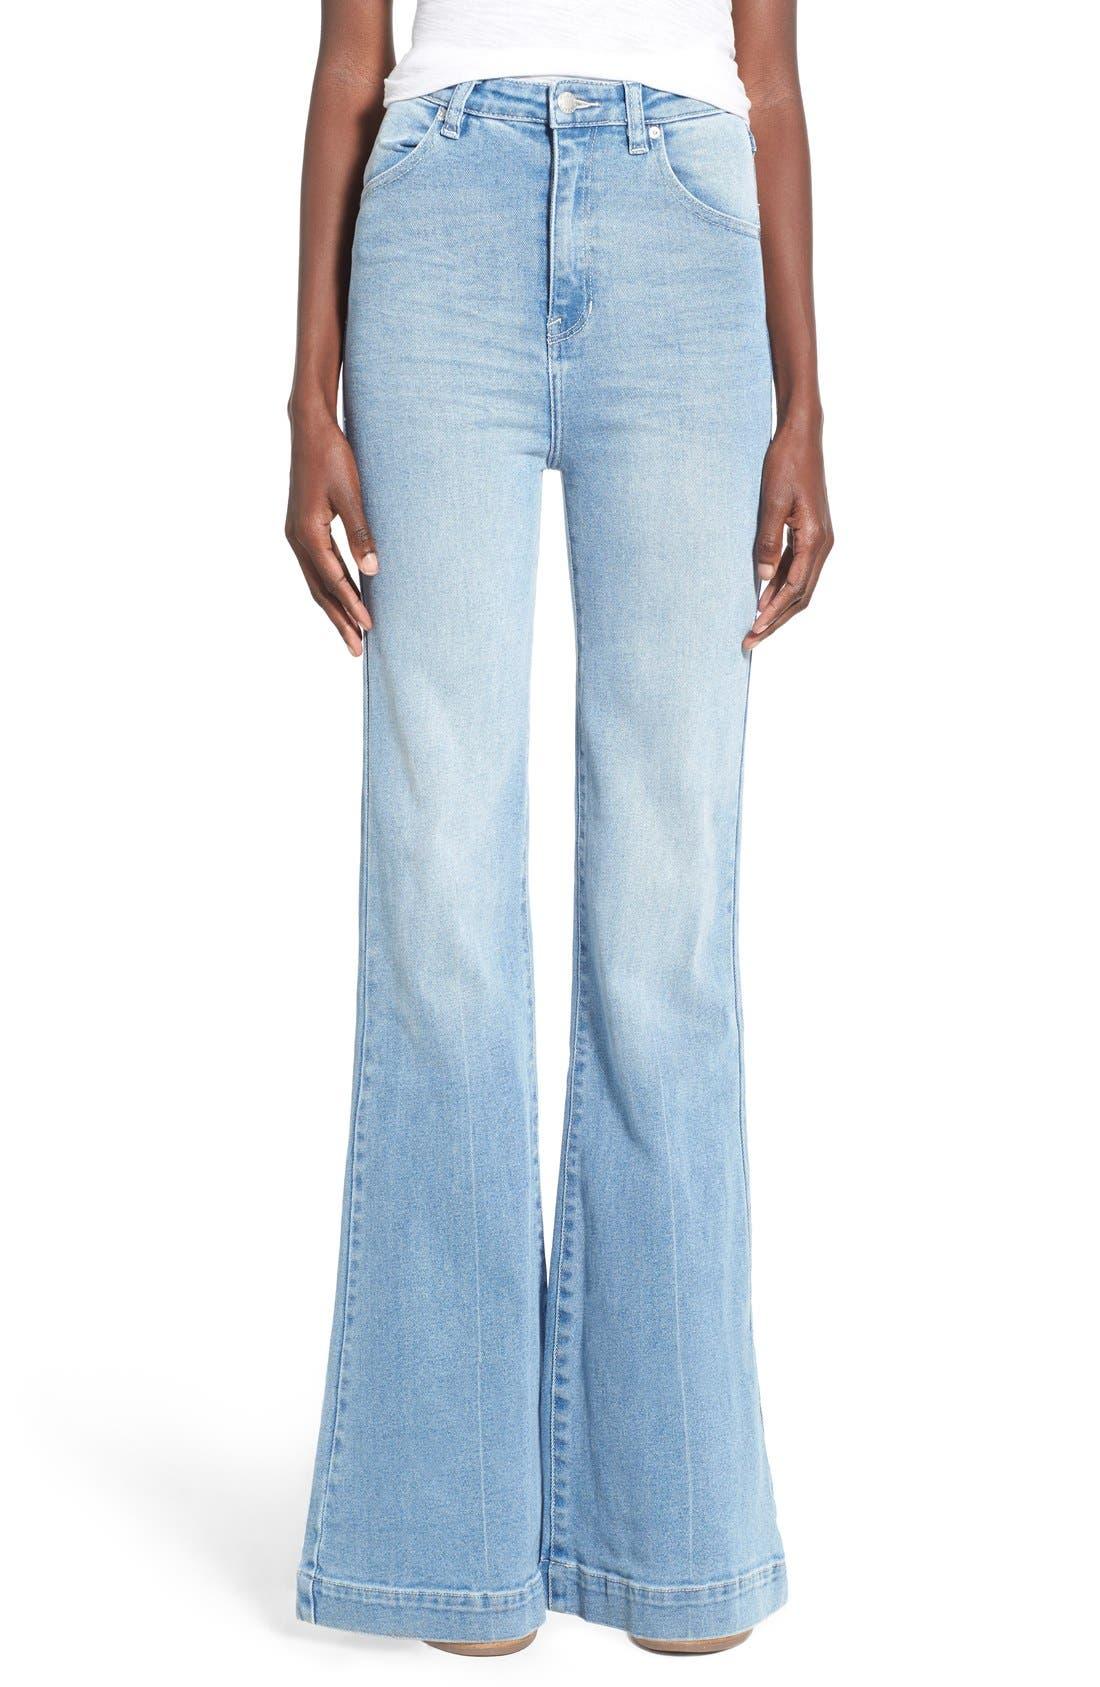 ROLLA'S,                             'East Coast' Flare Jeans,                             Main thumbnail 1, color,                             430